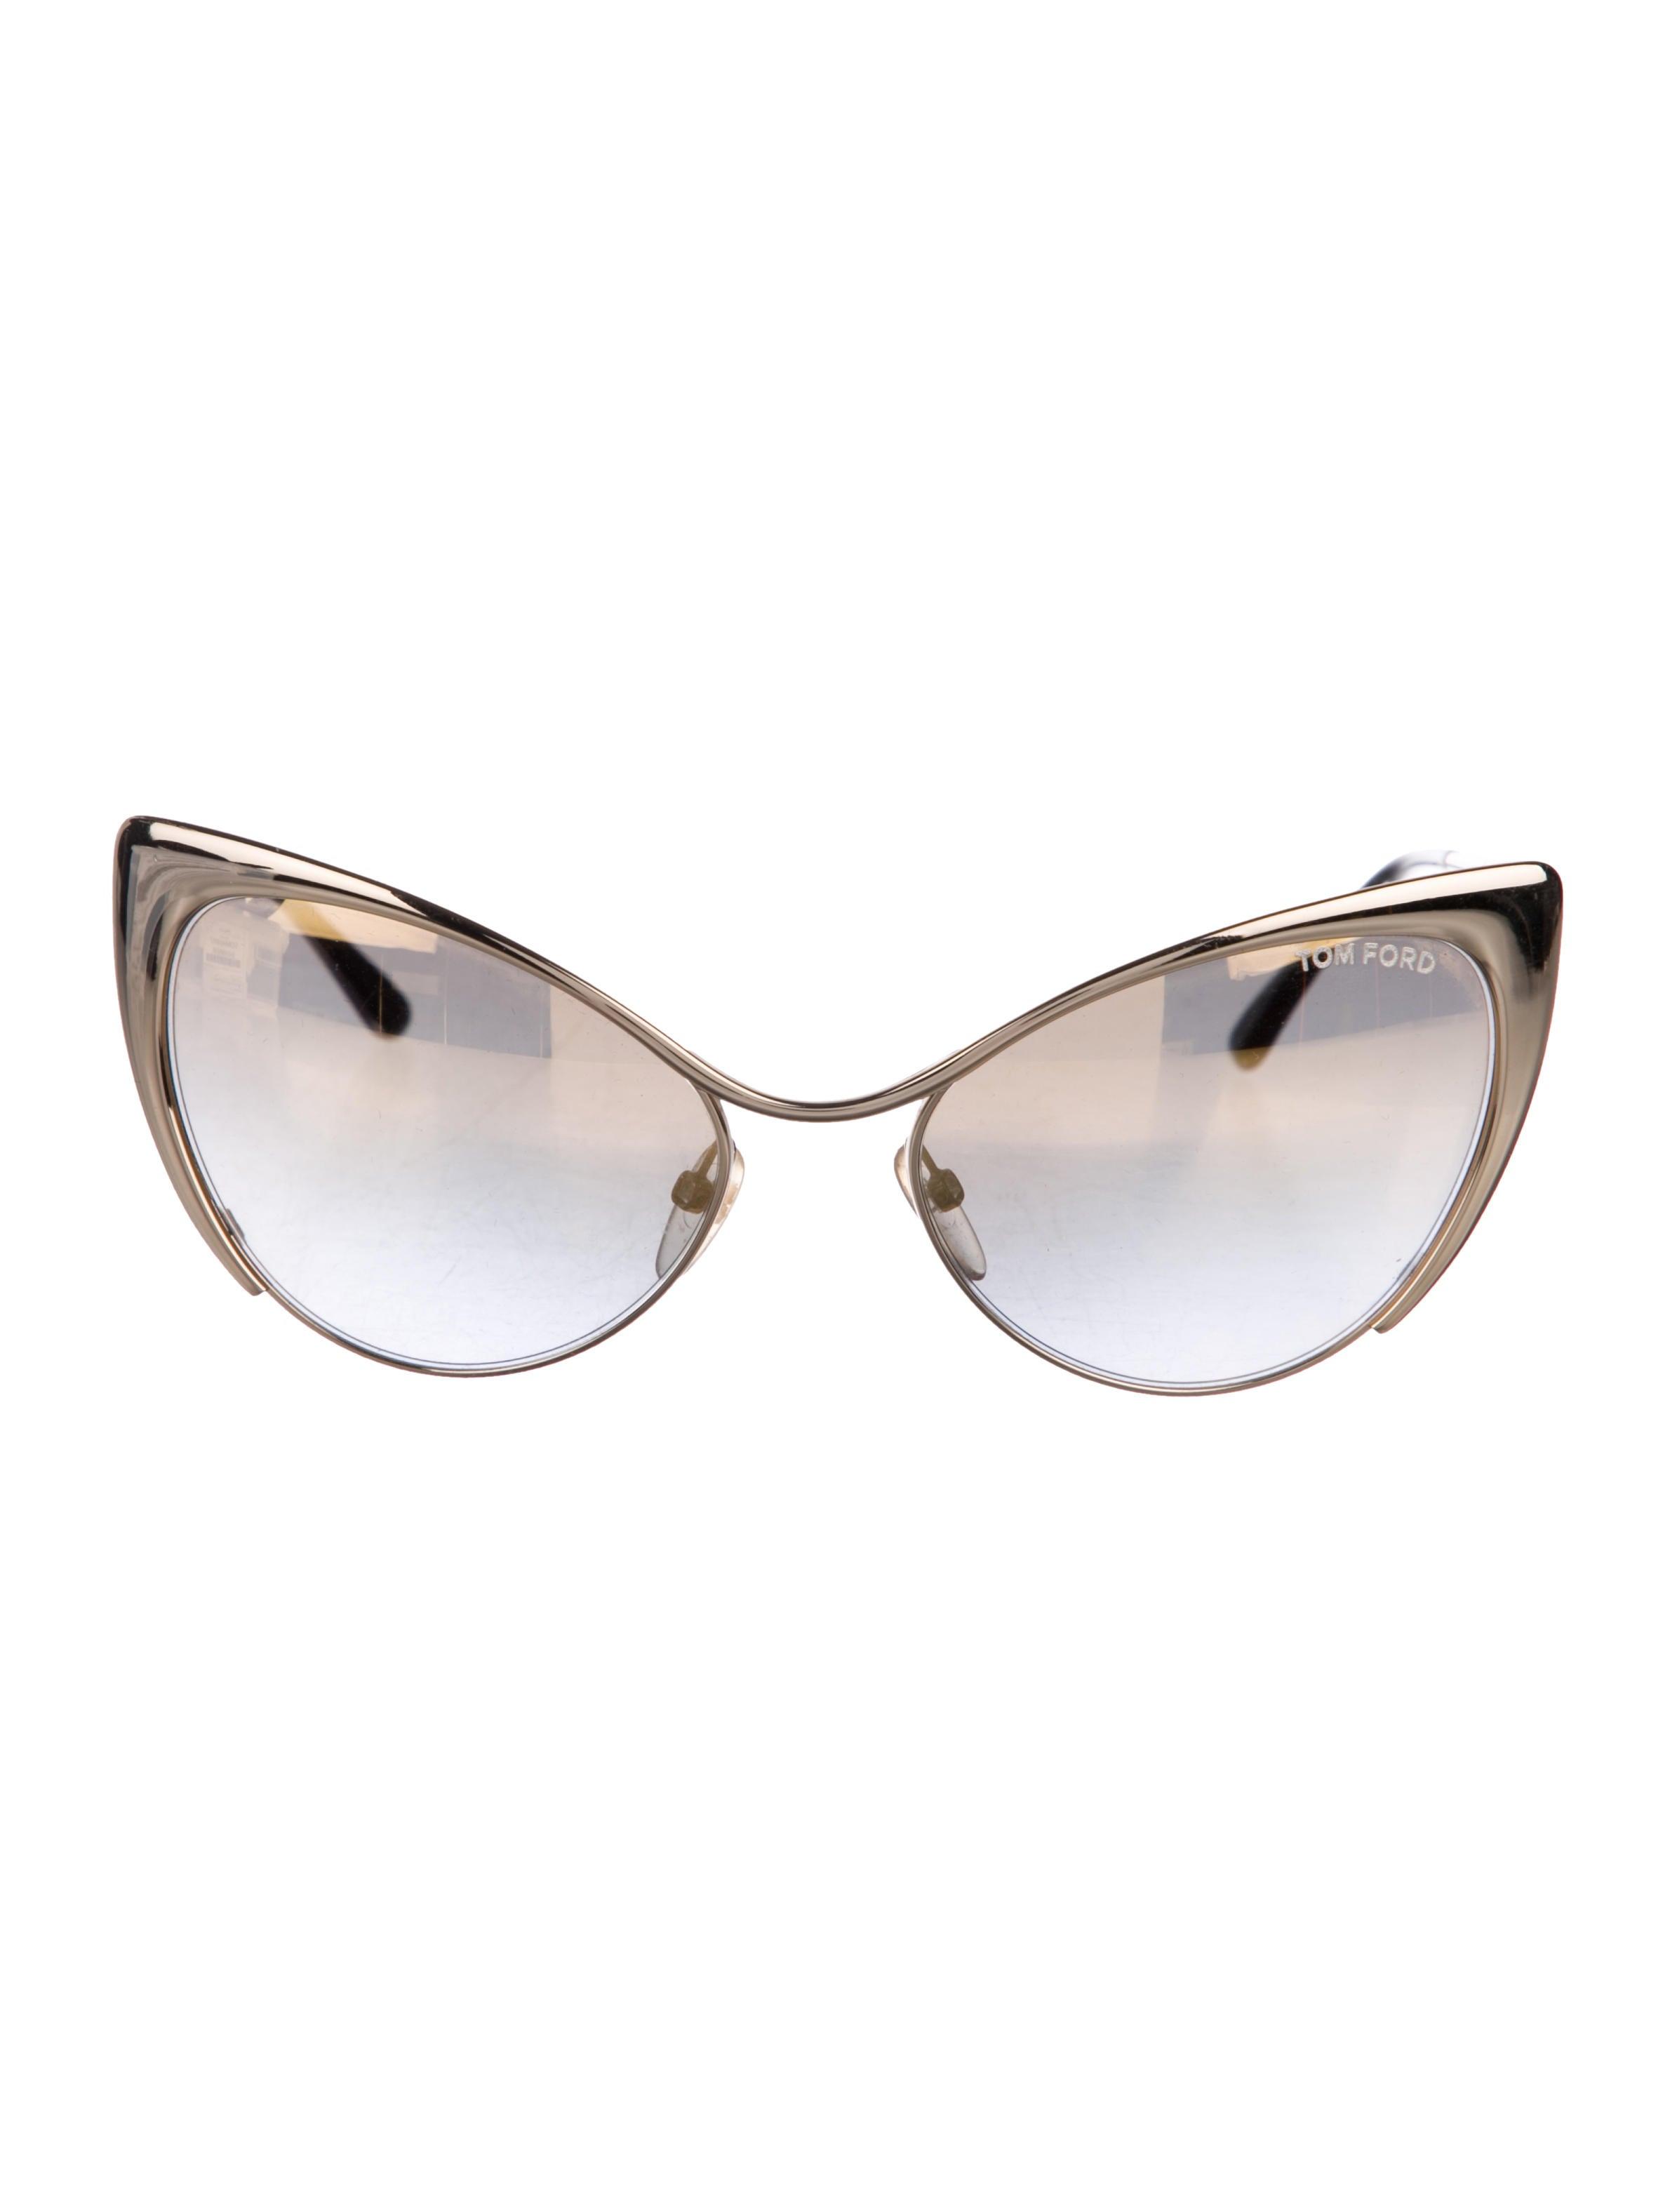 52a9b7579ba7 Tom Ford Nastasya Cat-Eye Sunglasses - Accessories - TOM46887 | The ...